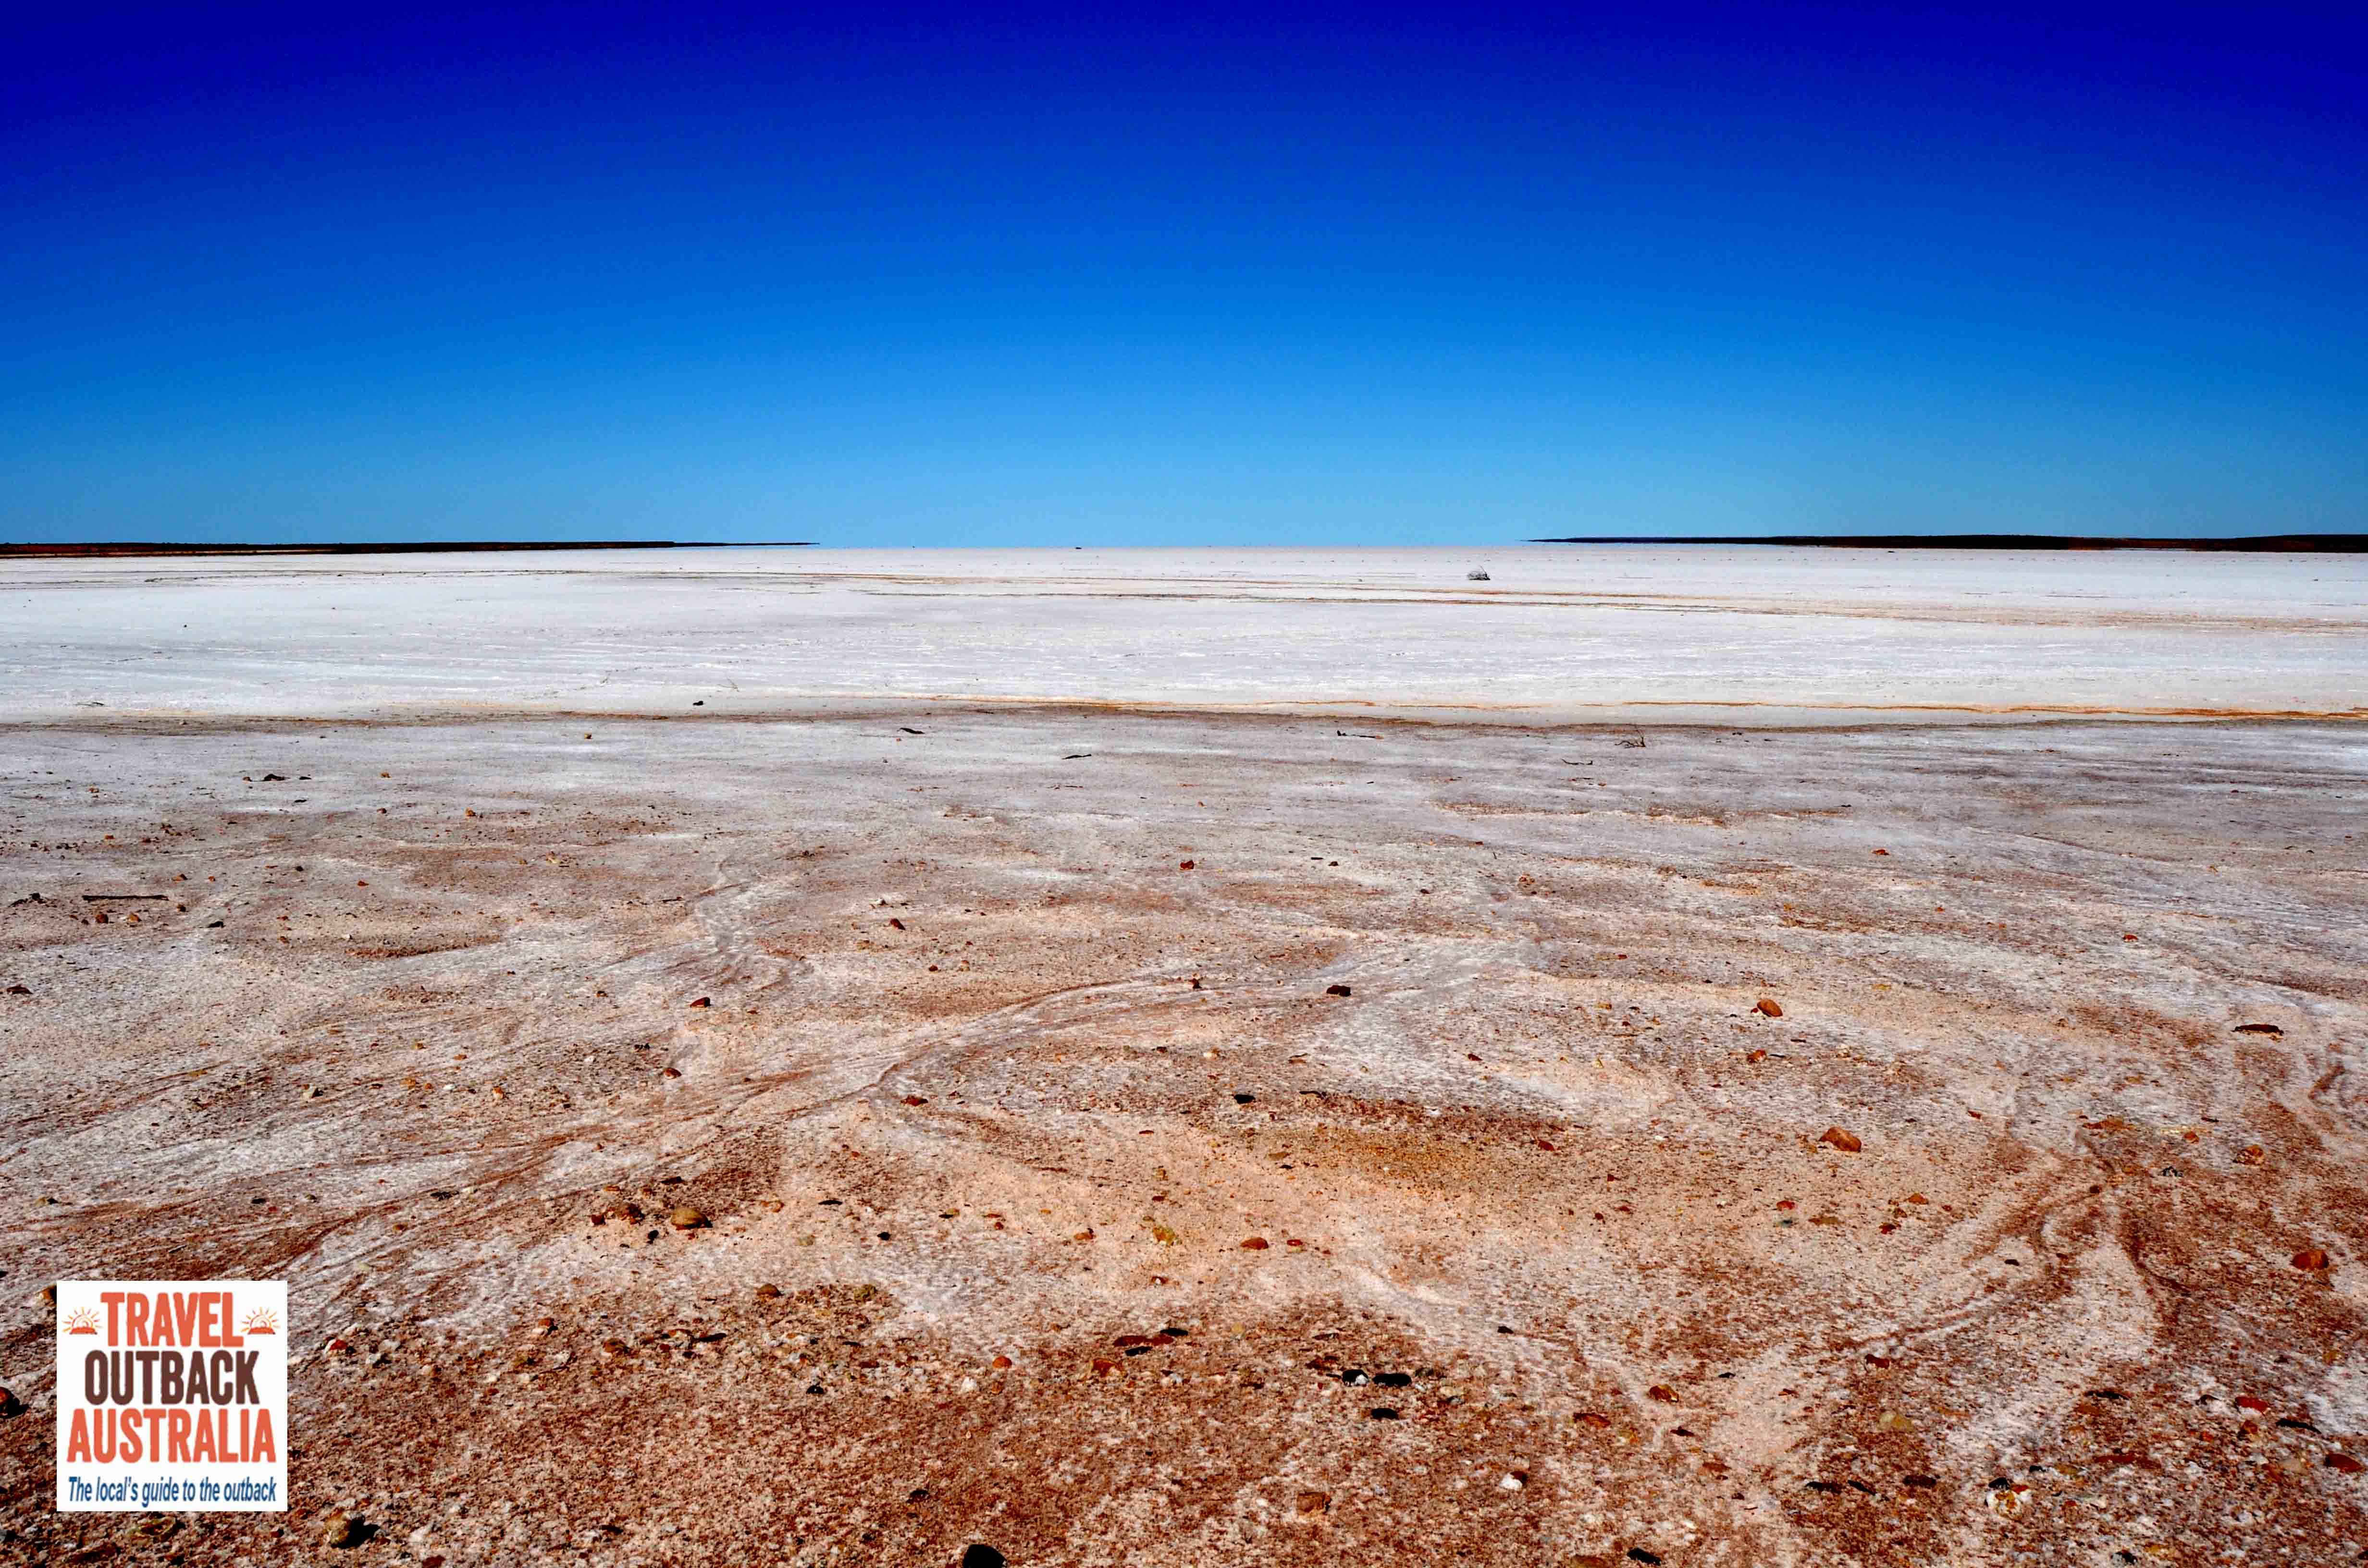 Australias largest lake